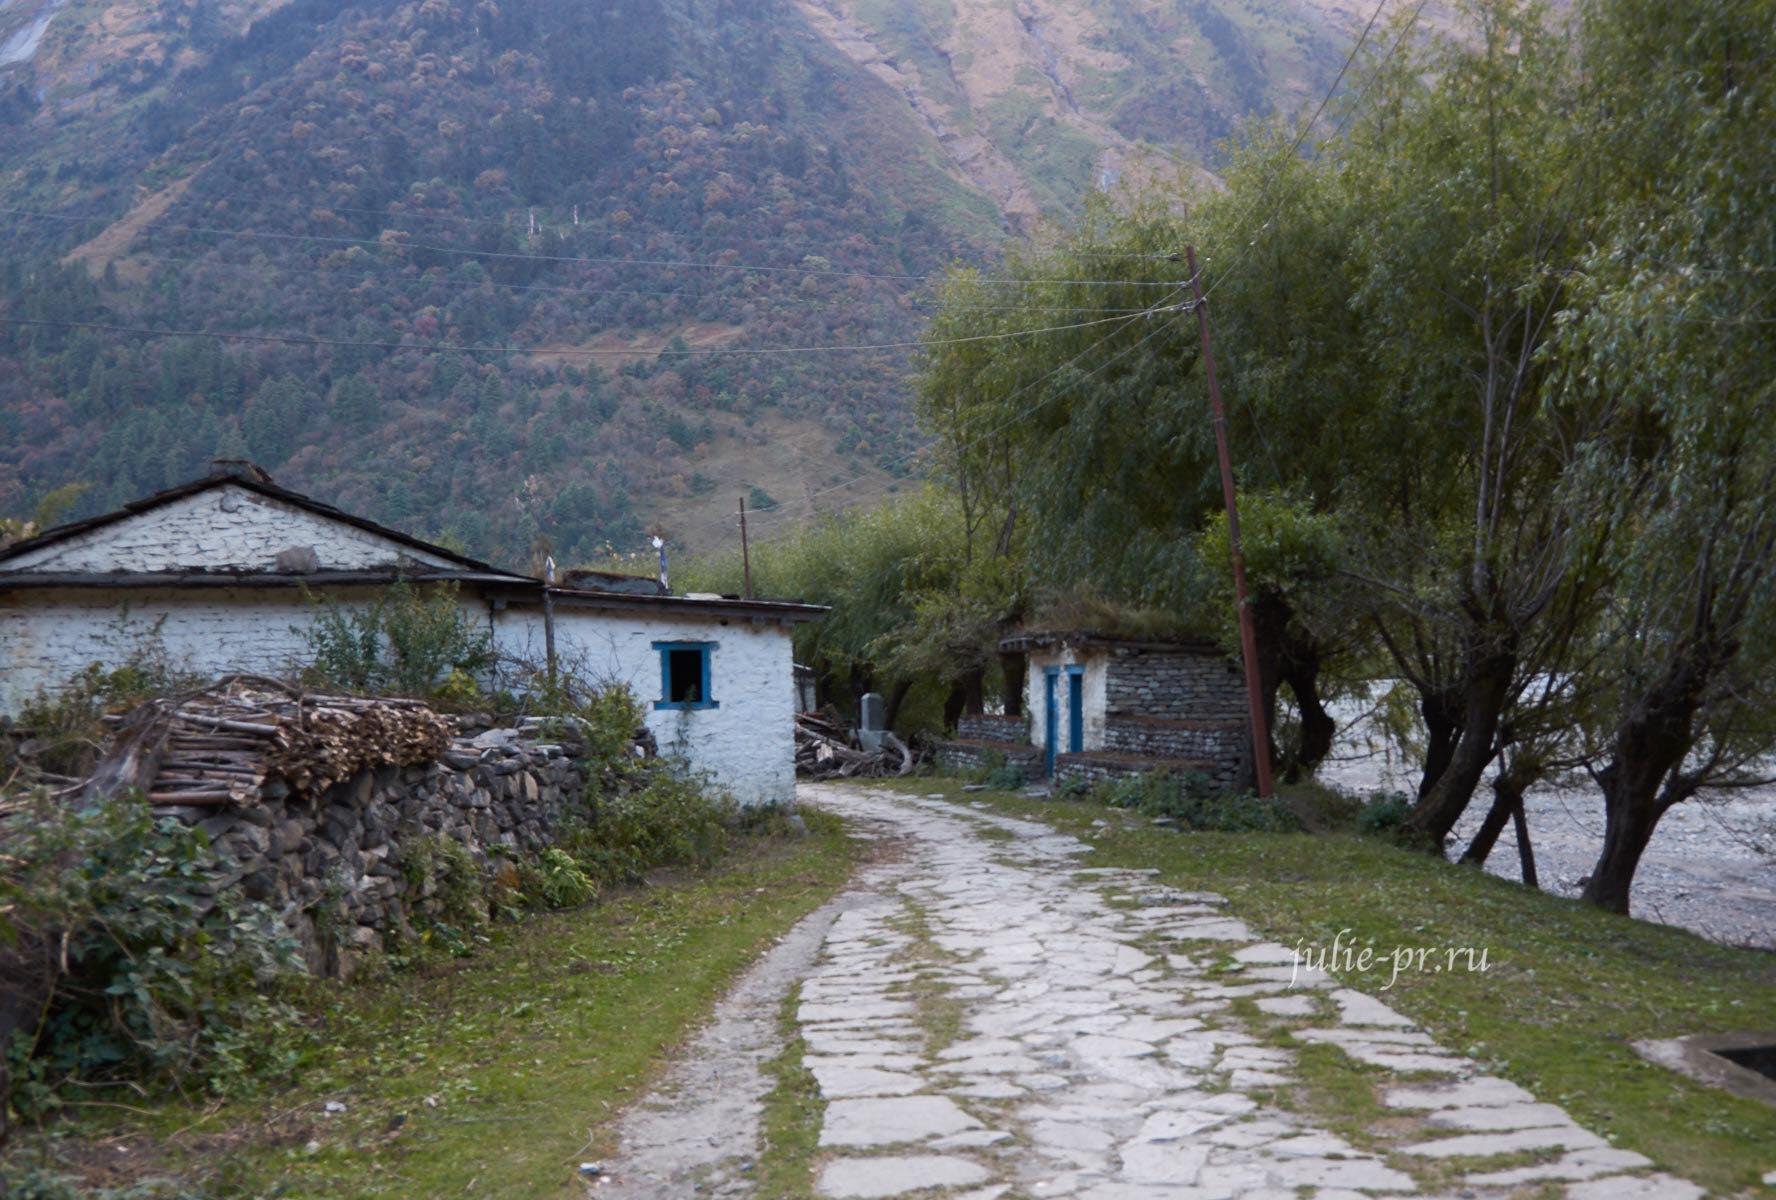 Непал, Трек вокруг Аннапурны, Деревня Кокхетанти